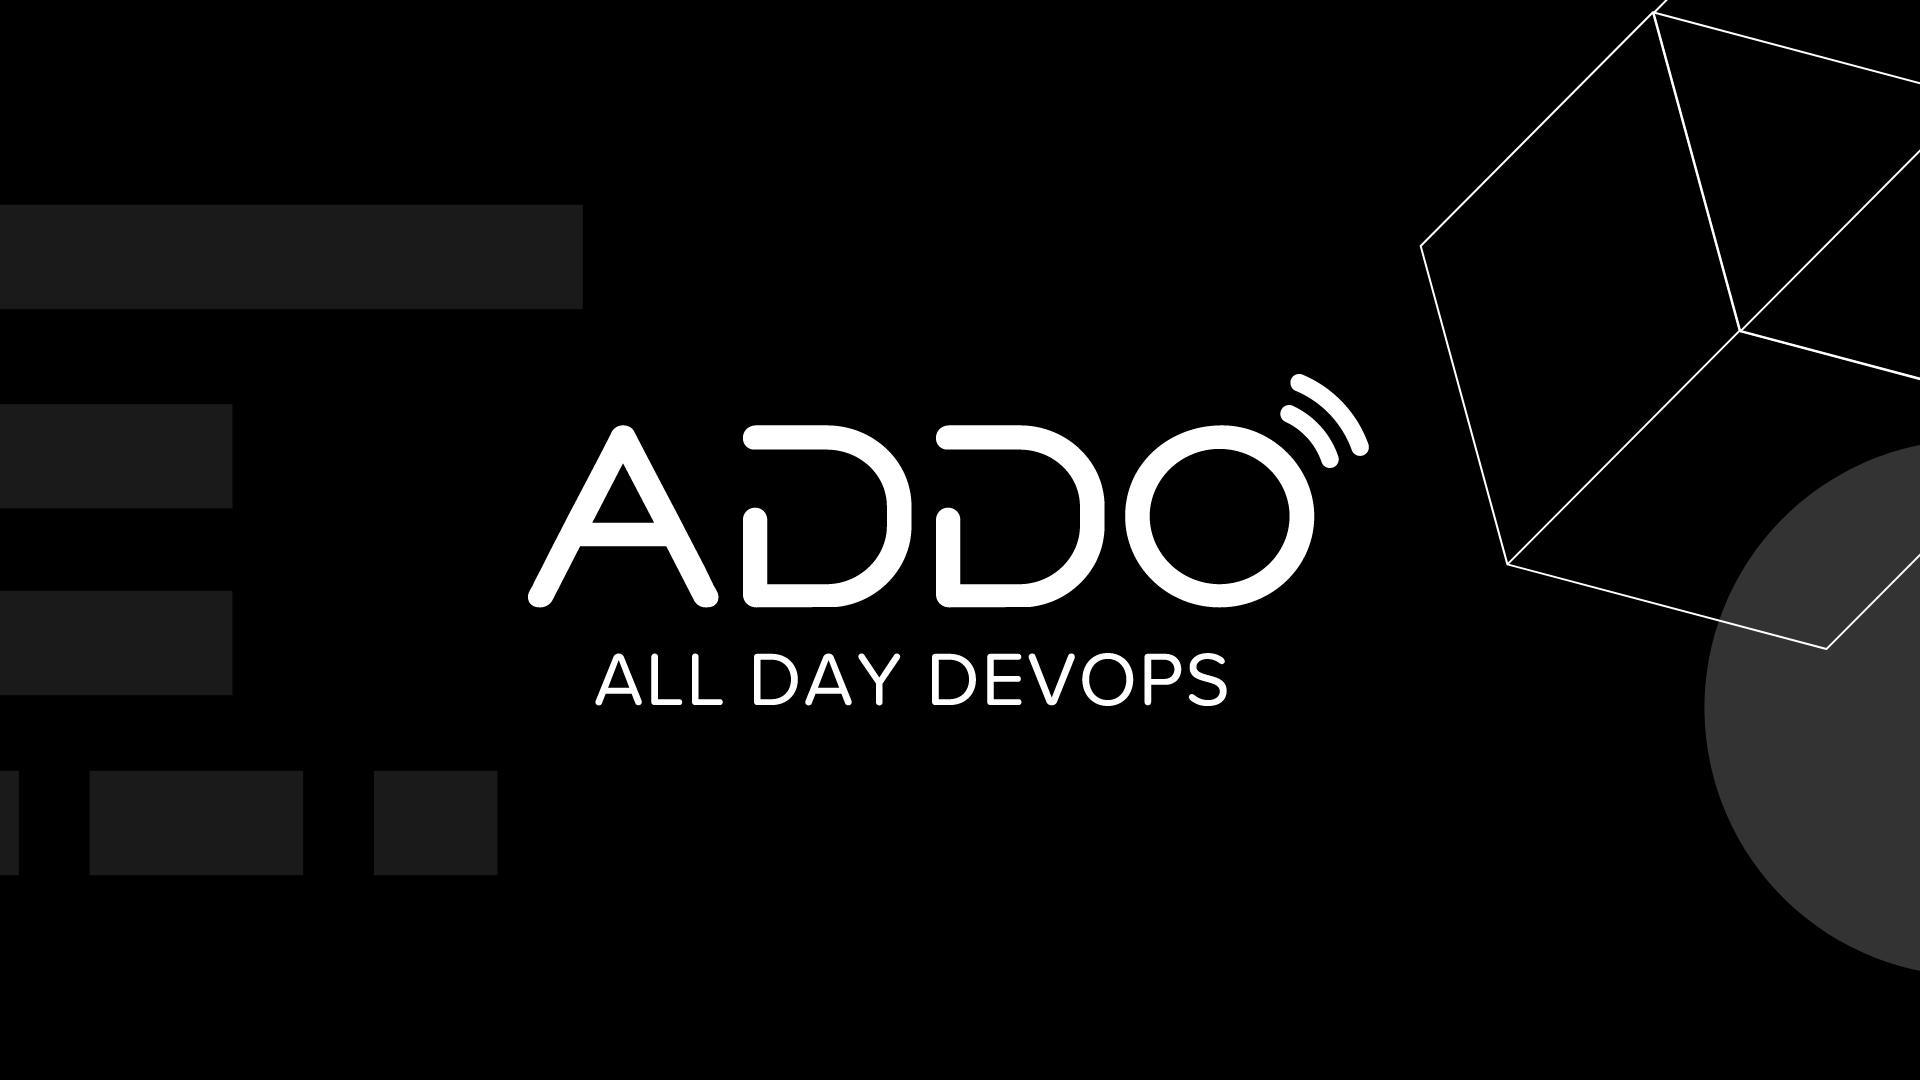 All Day DevOps